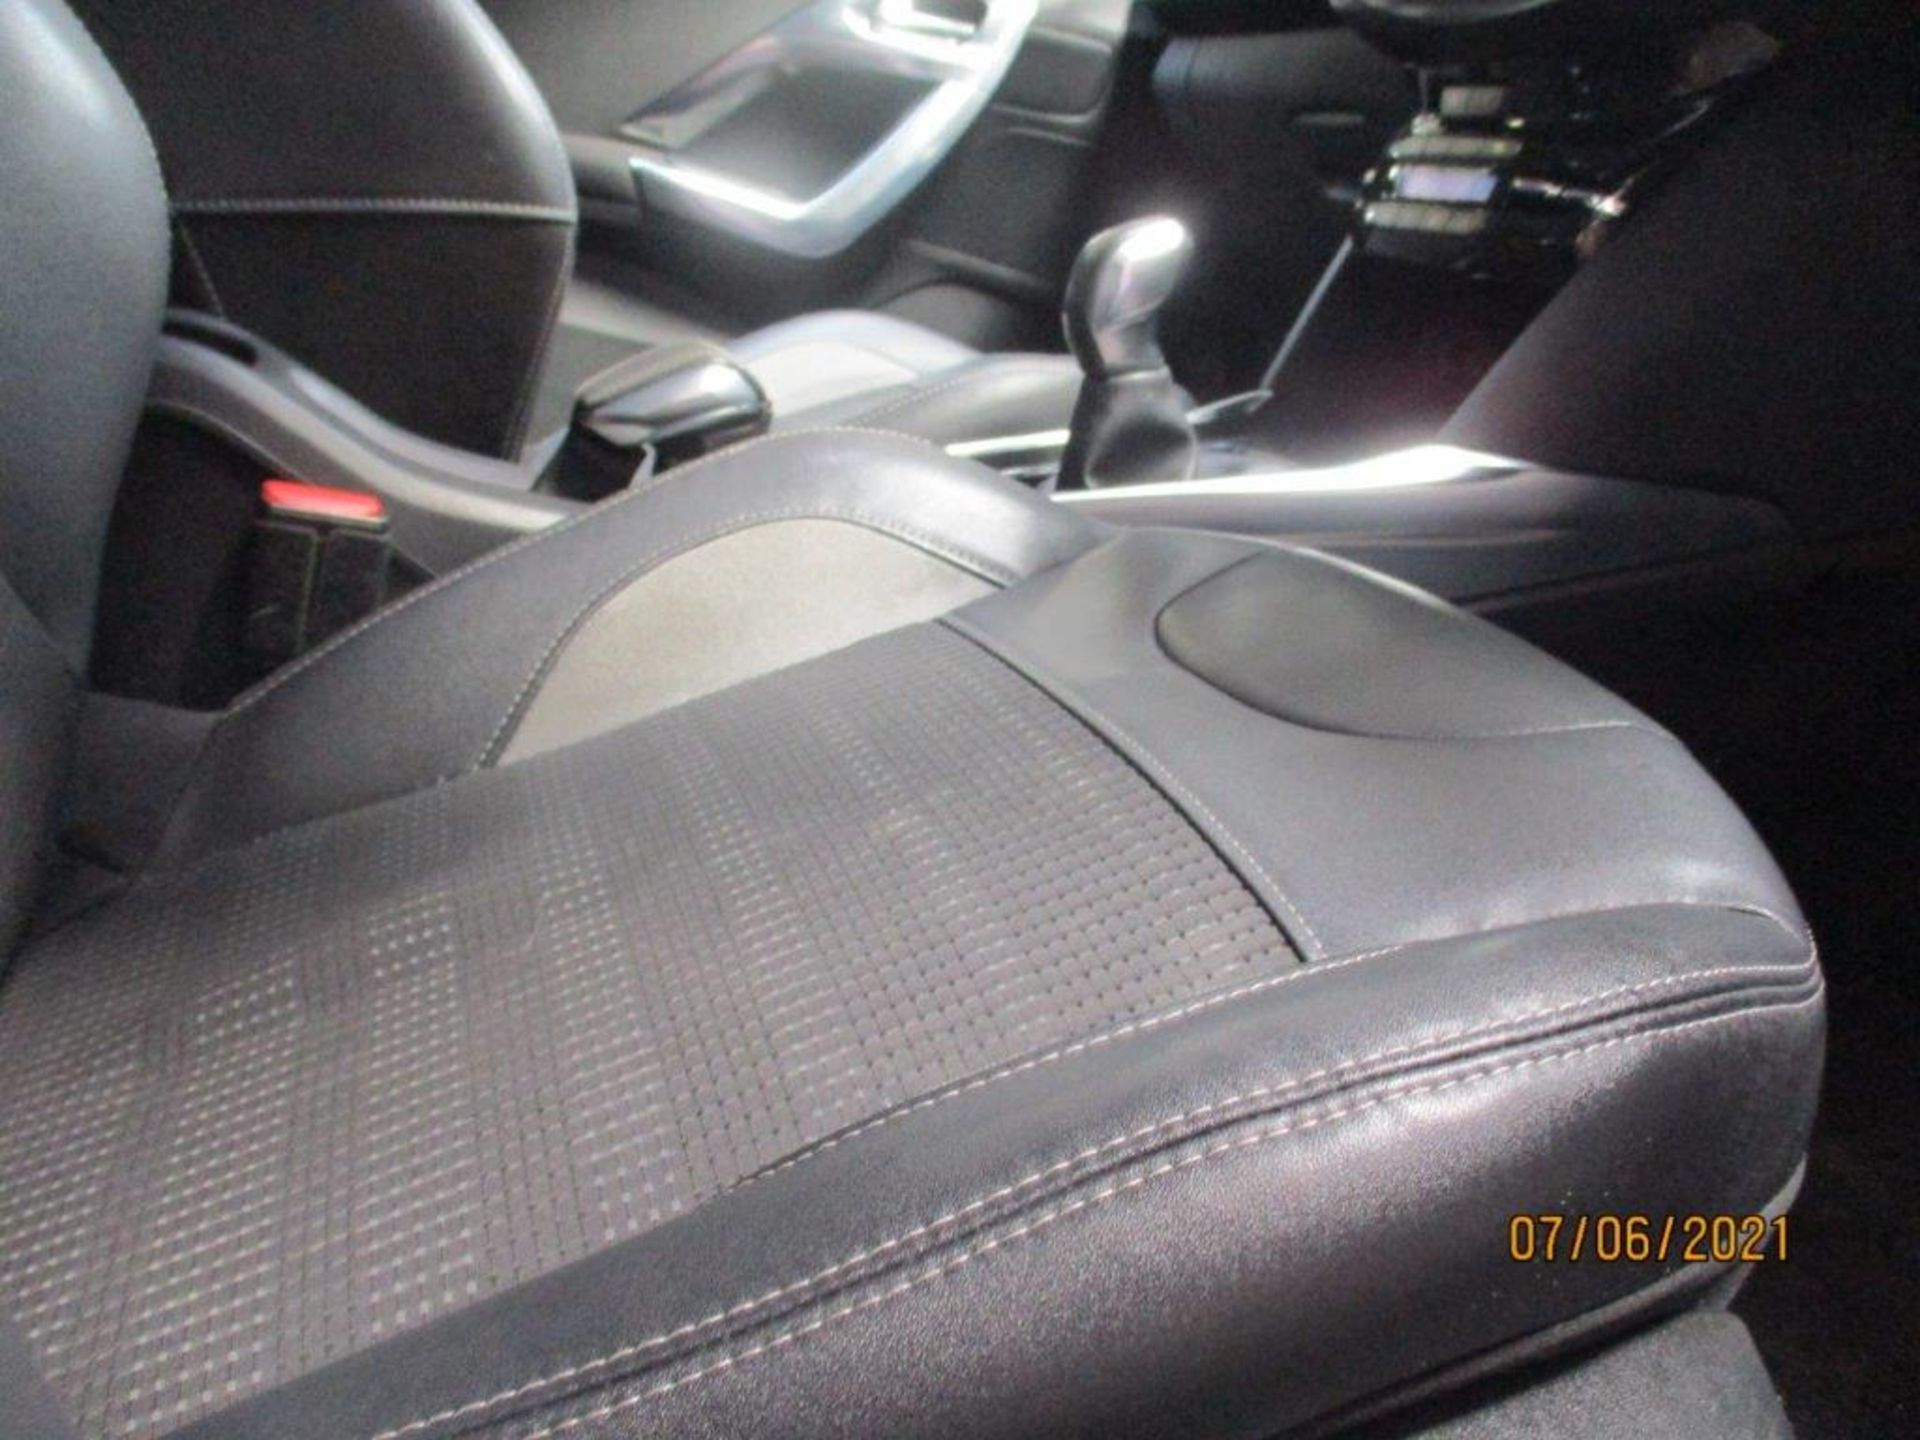 64 15 Peugeot 2008 Allure E-HDI - Image 22 of 25